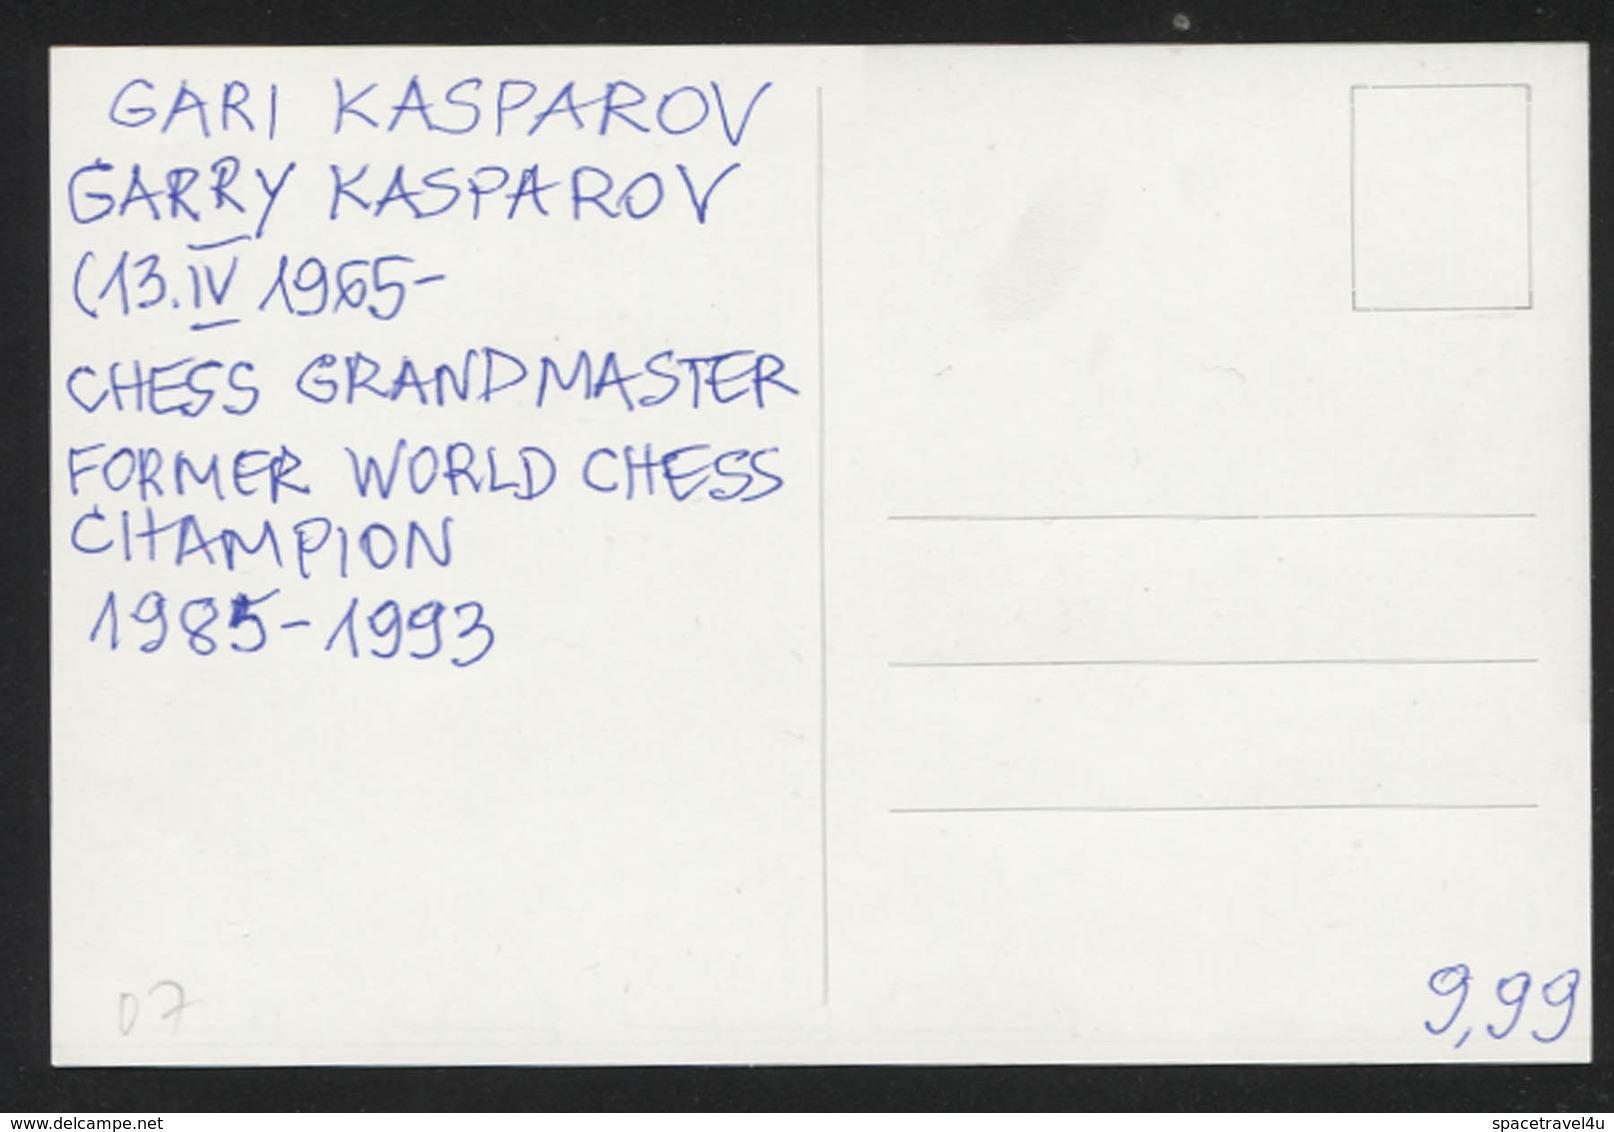 Garry Kasparov - Chess Grandmaster, Former World Chess Champion -  Postcard - (CHESS-07) - Cartes Postales